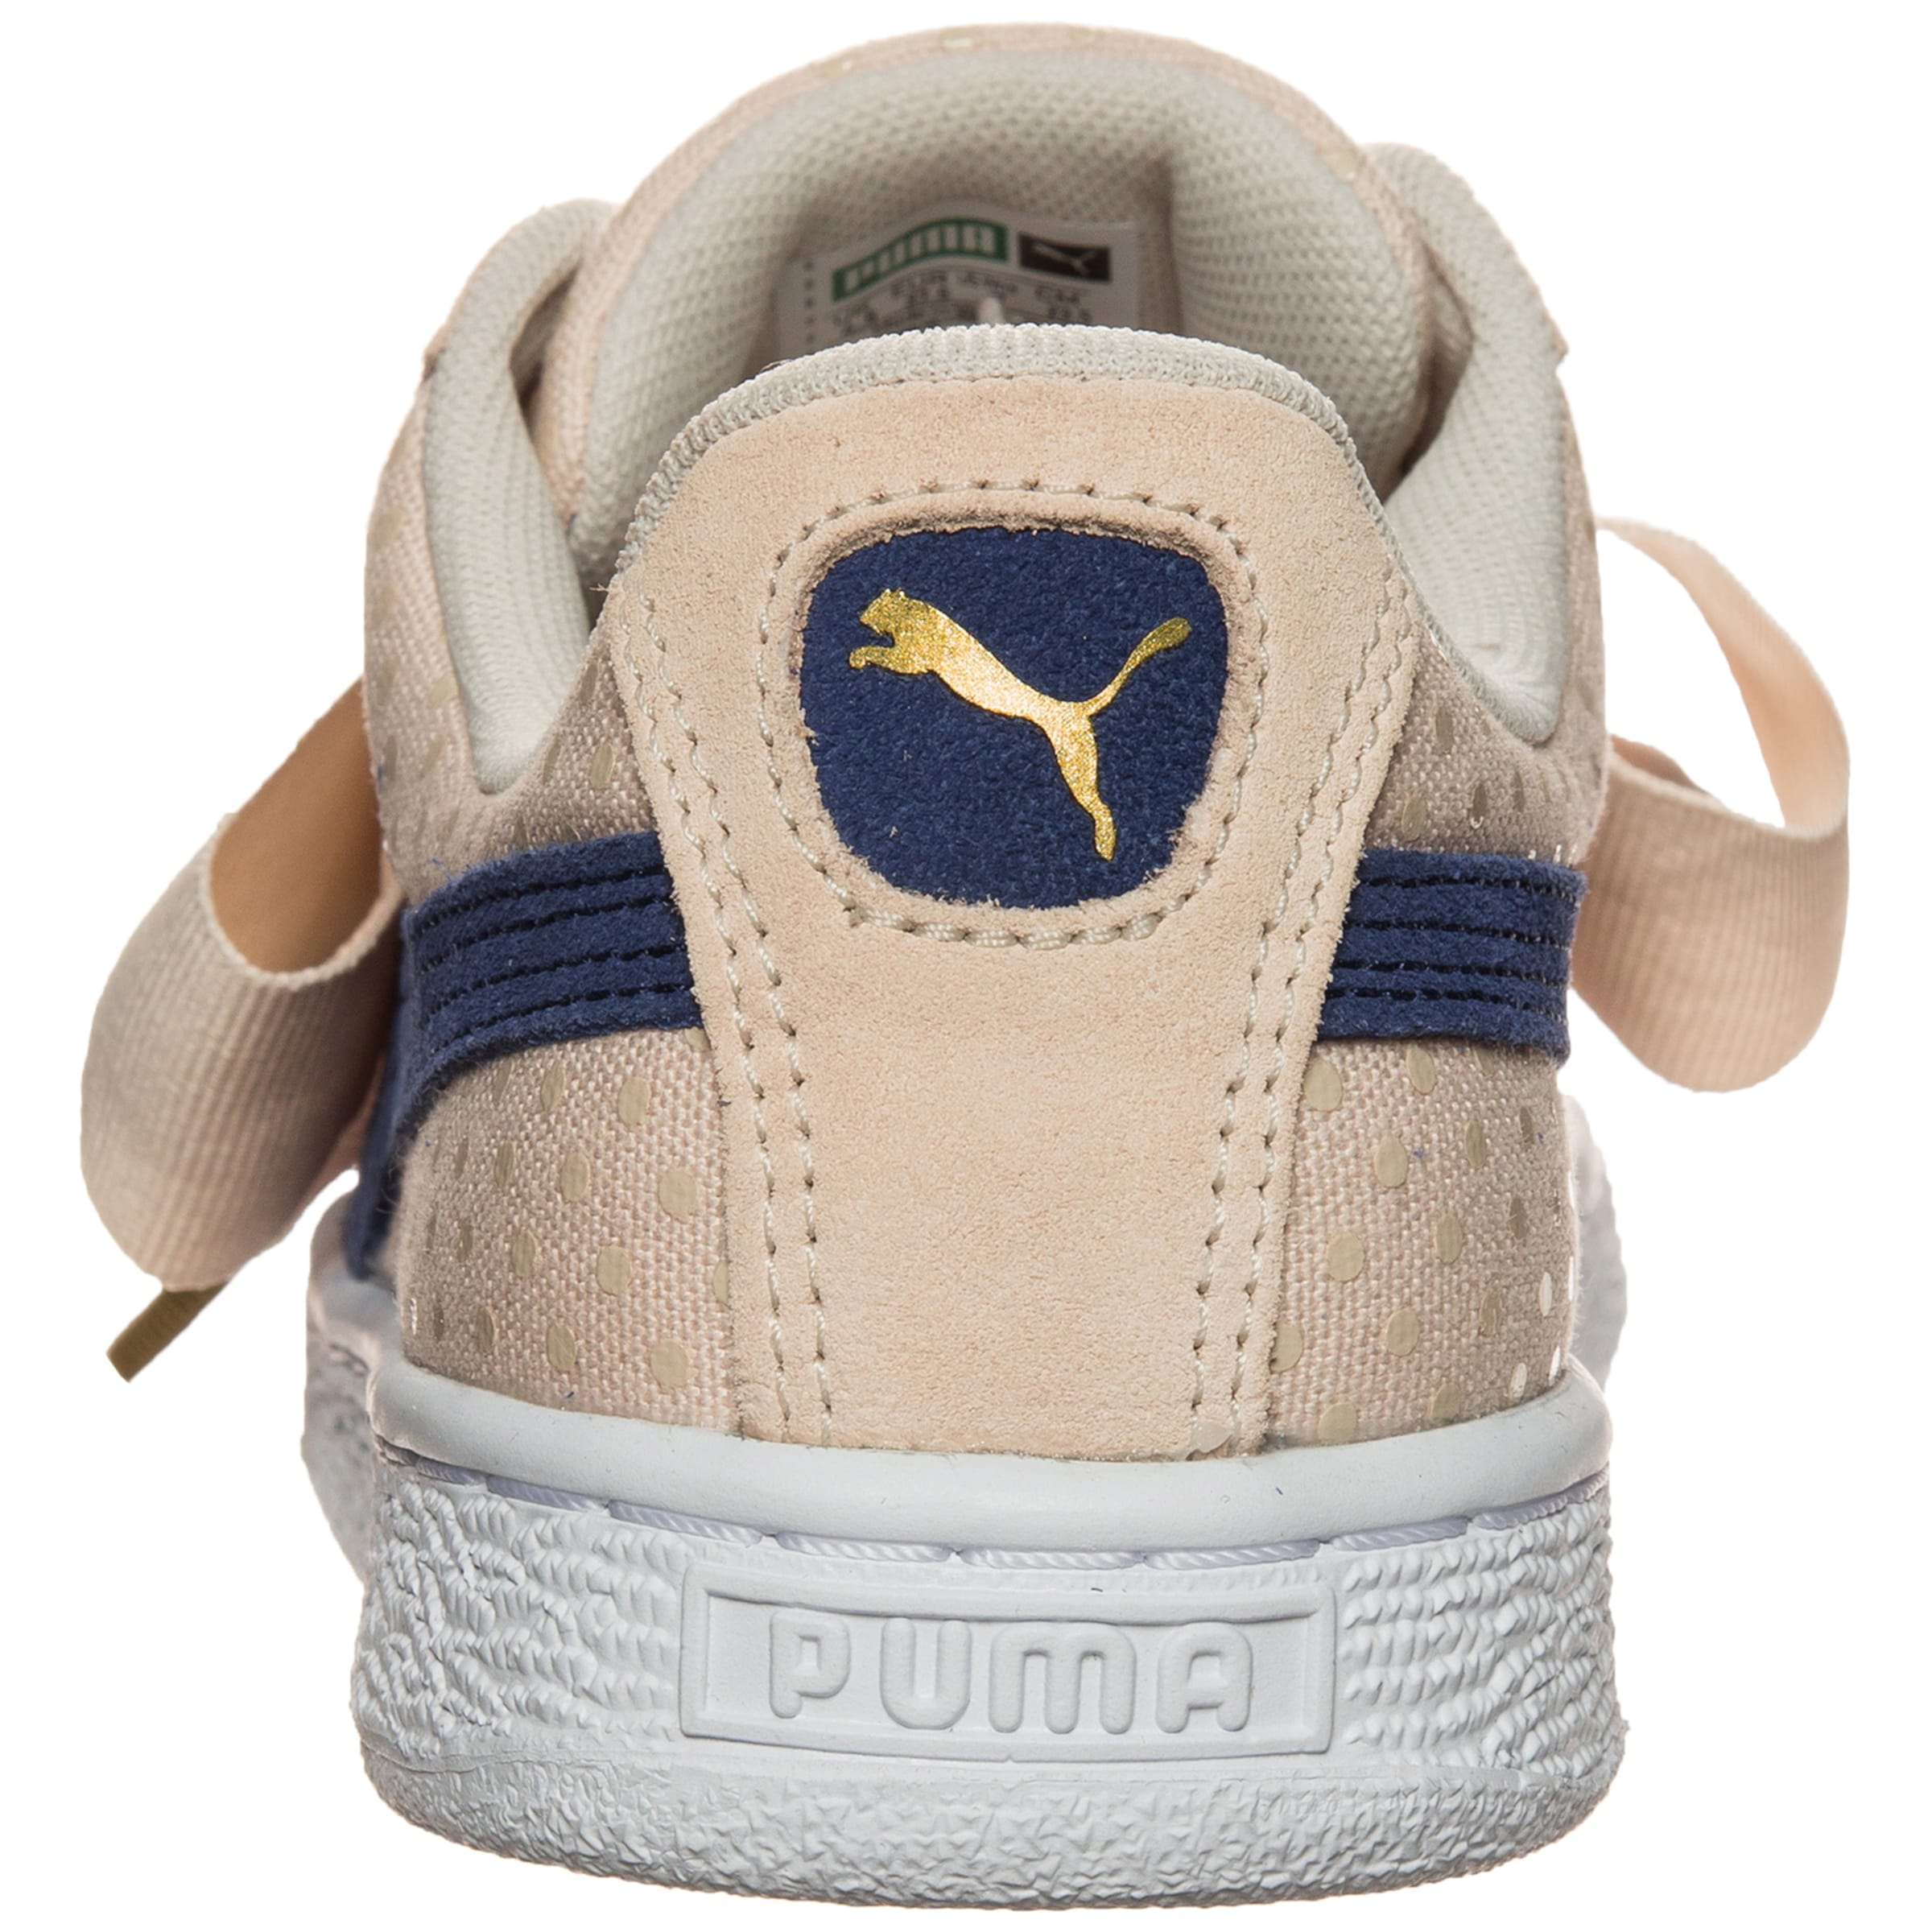 Rabatt Extrem PUMA 'Basket Heart Denim' Sneaker Einkaufen Genießen J6J3xW